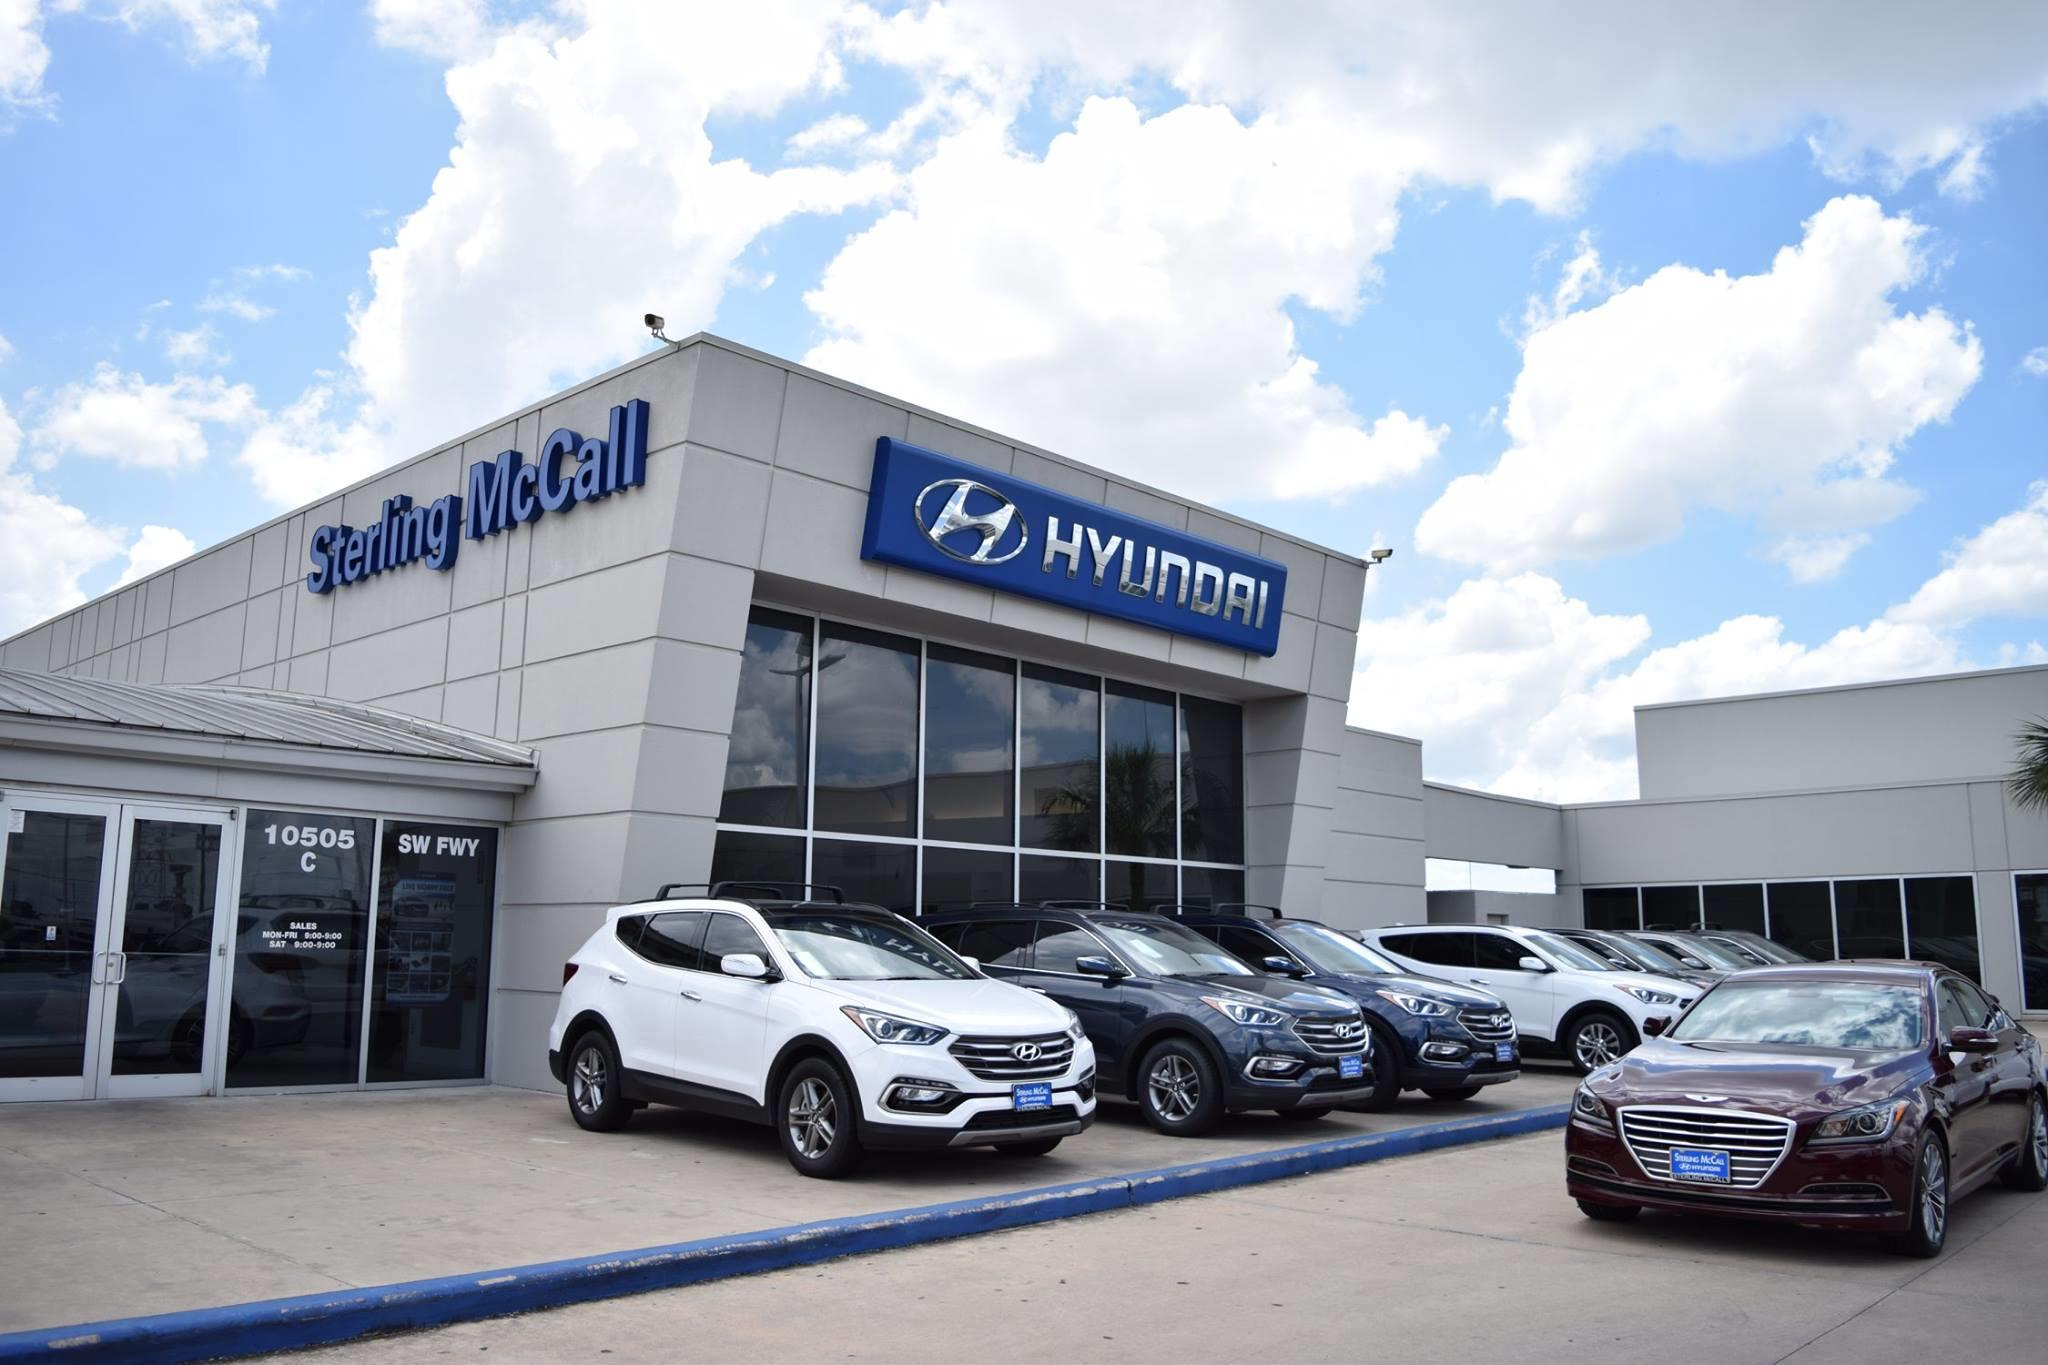 new the sel sedan hyundai sonata dealership in fwd area inventory milwaukee